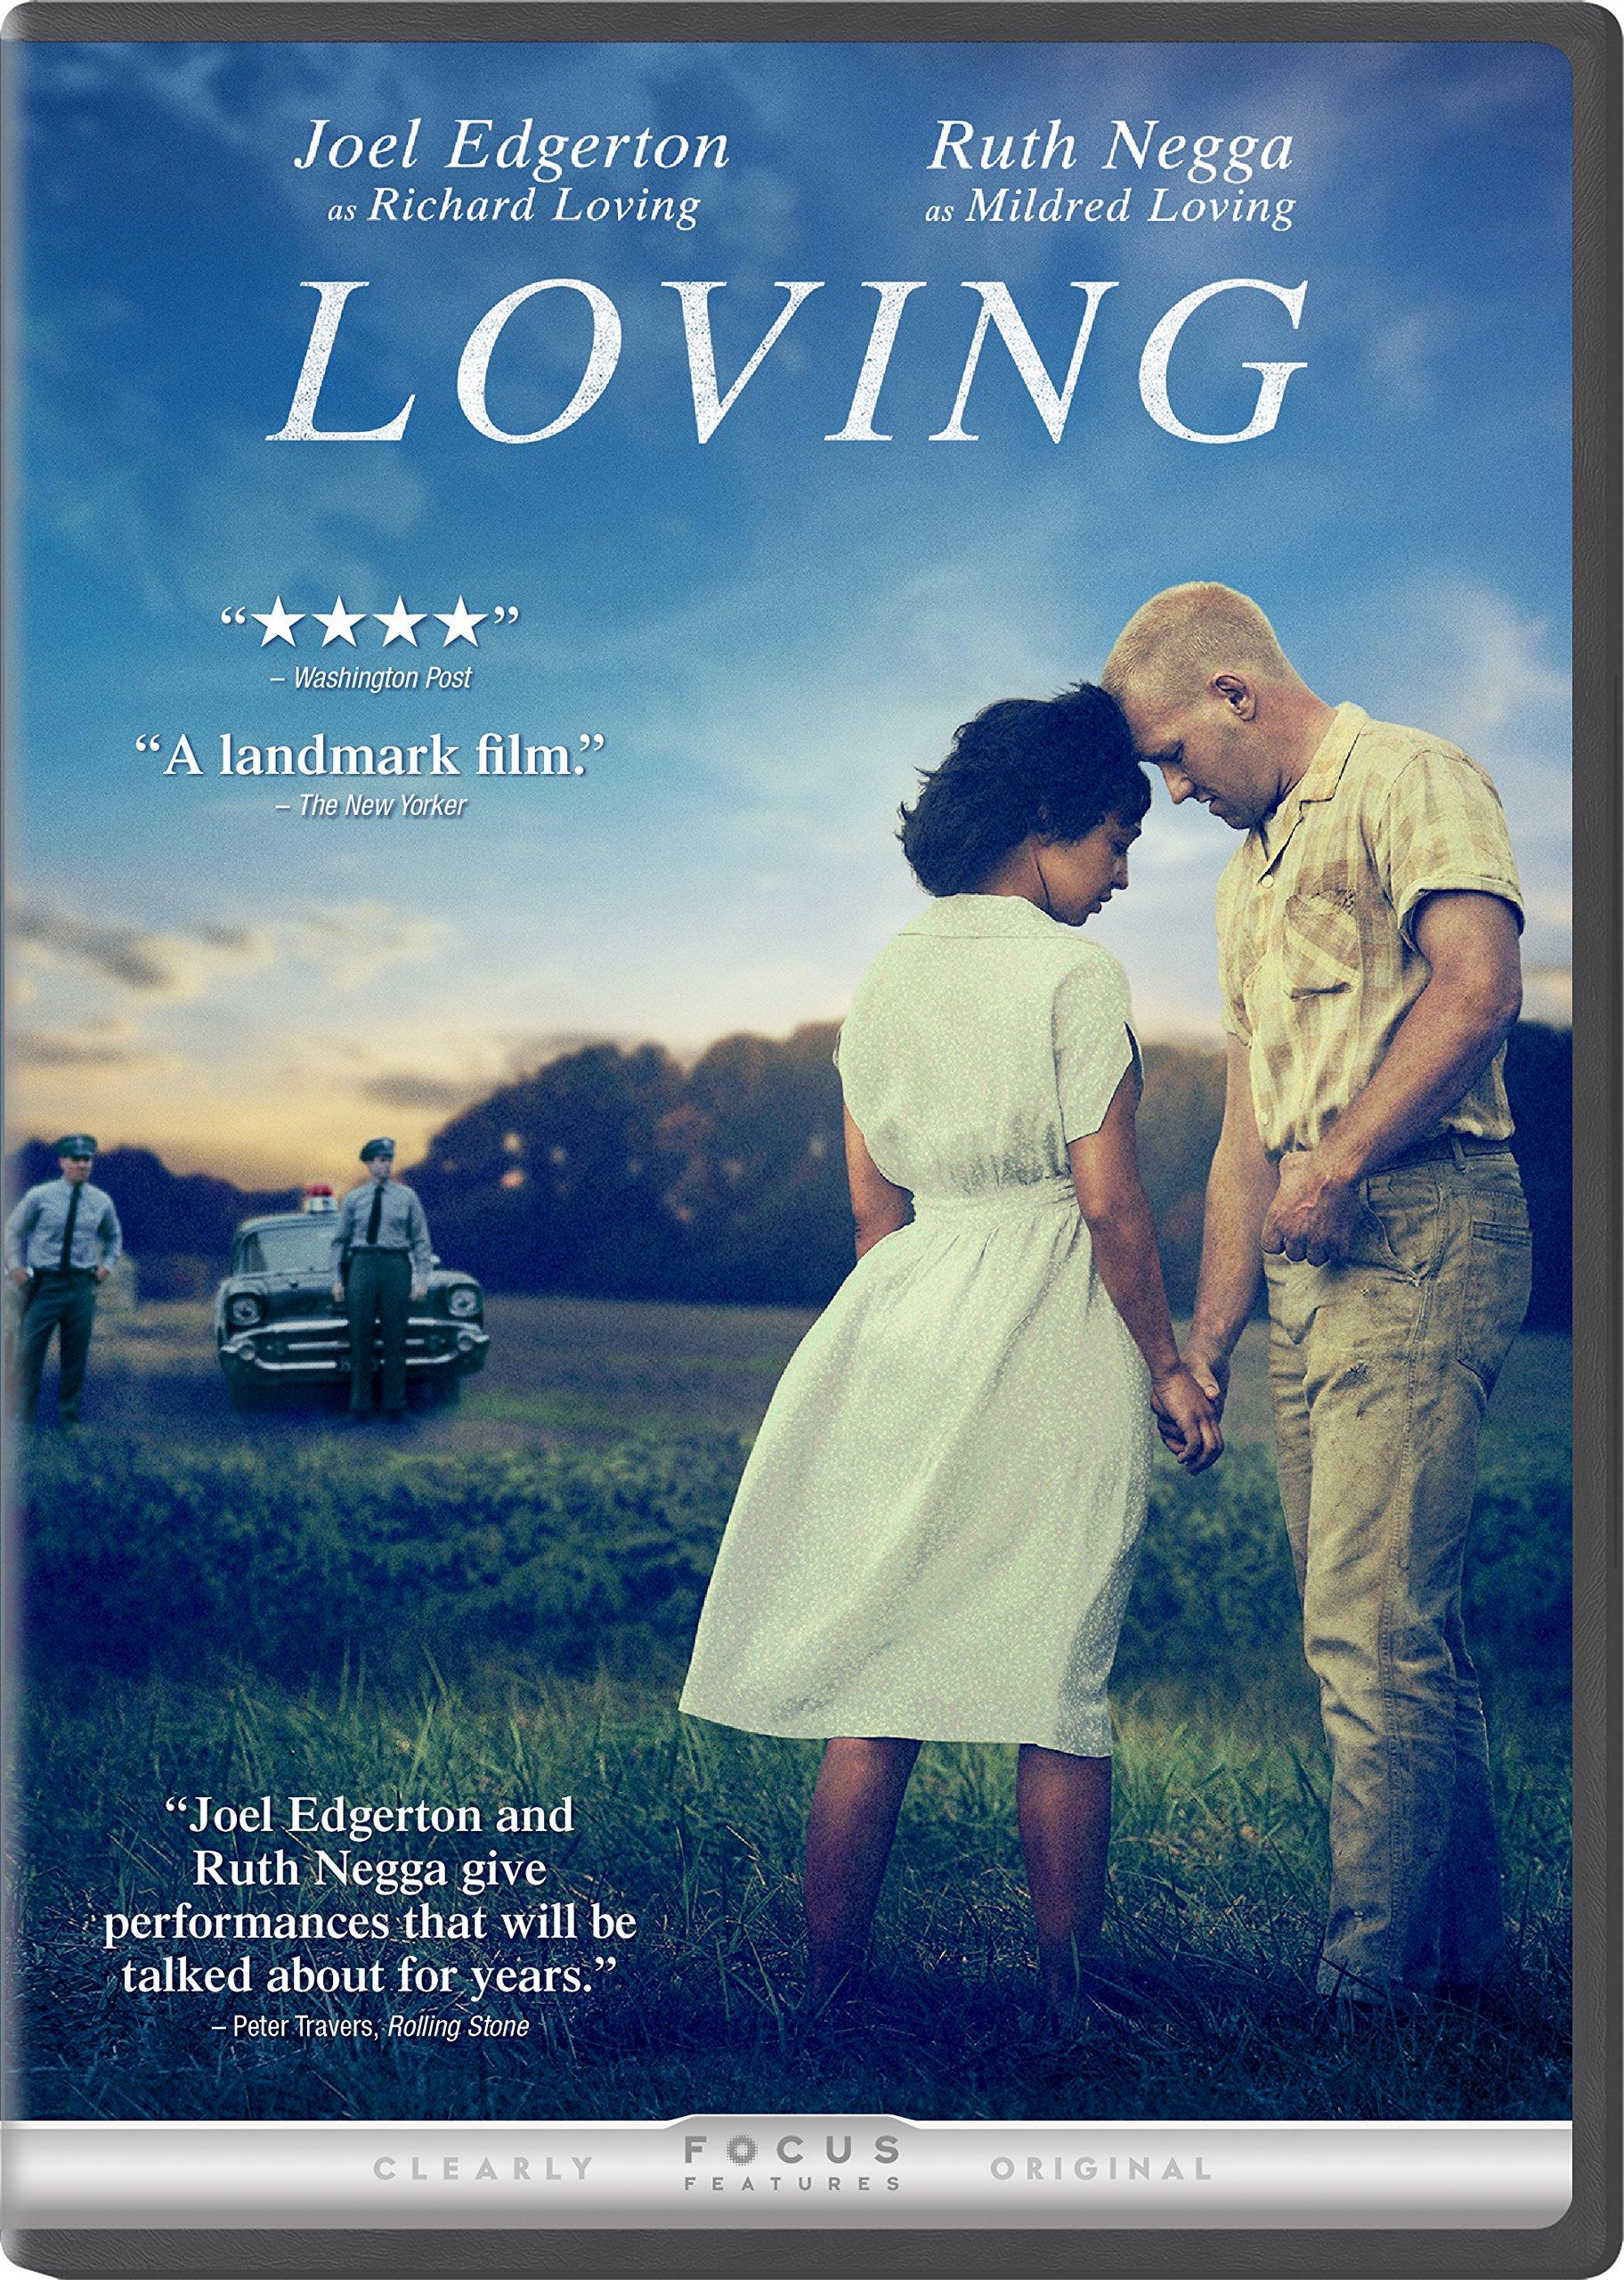 Buy Loving Now!